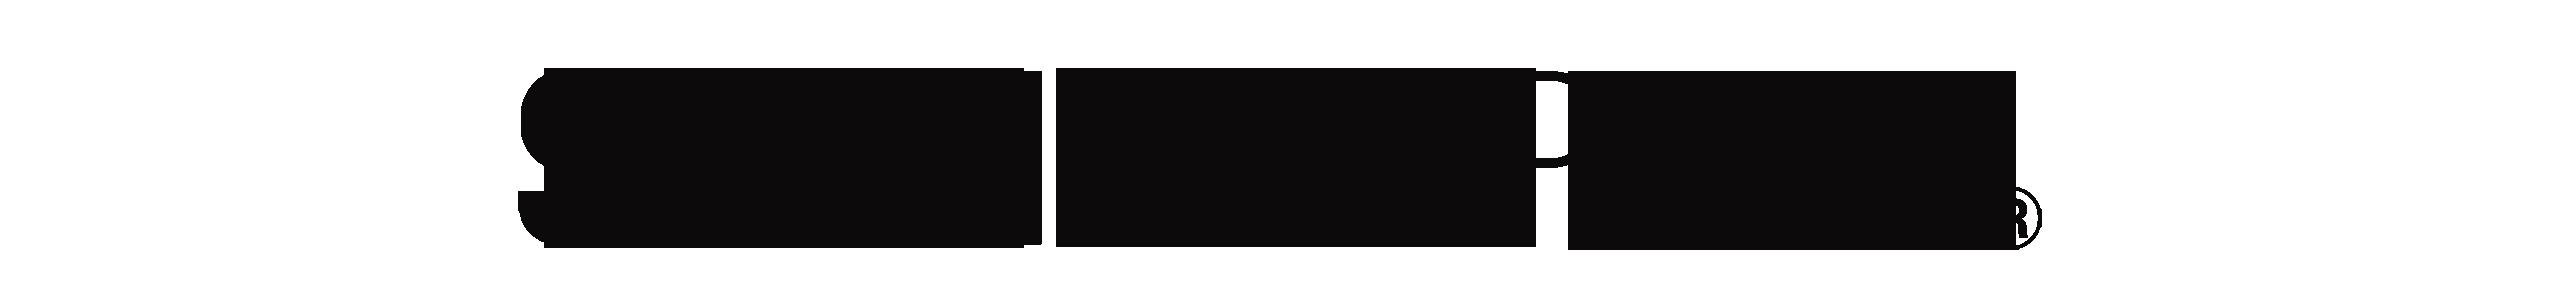 soundspriteshop